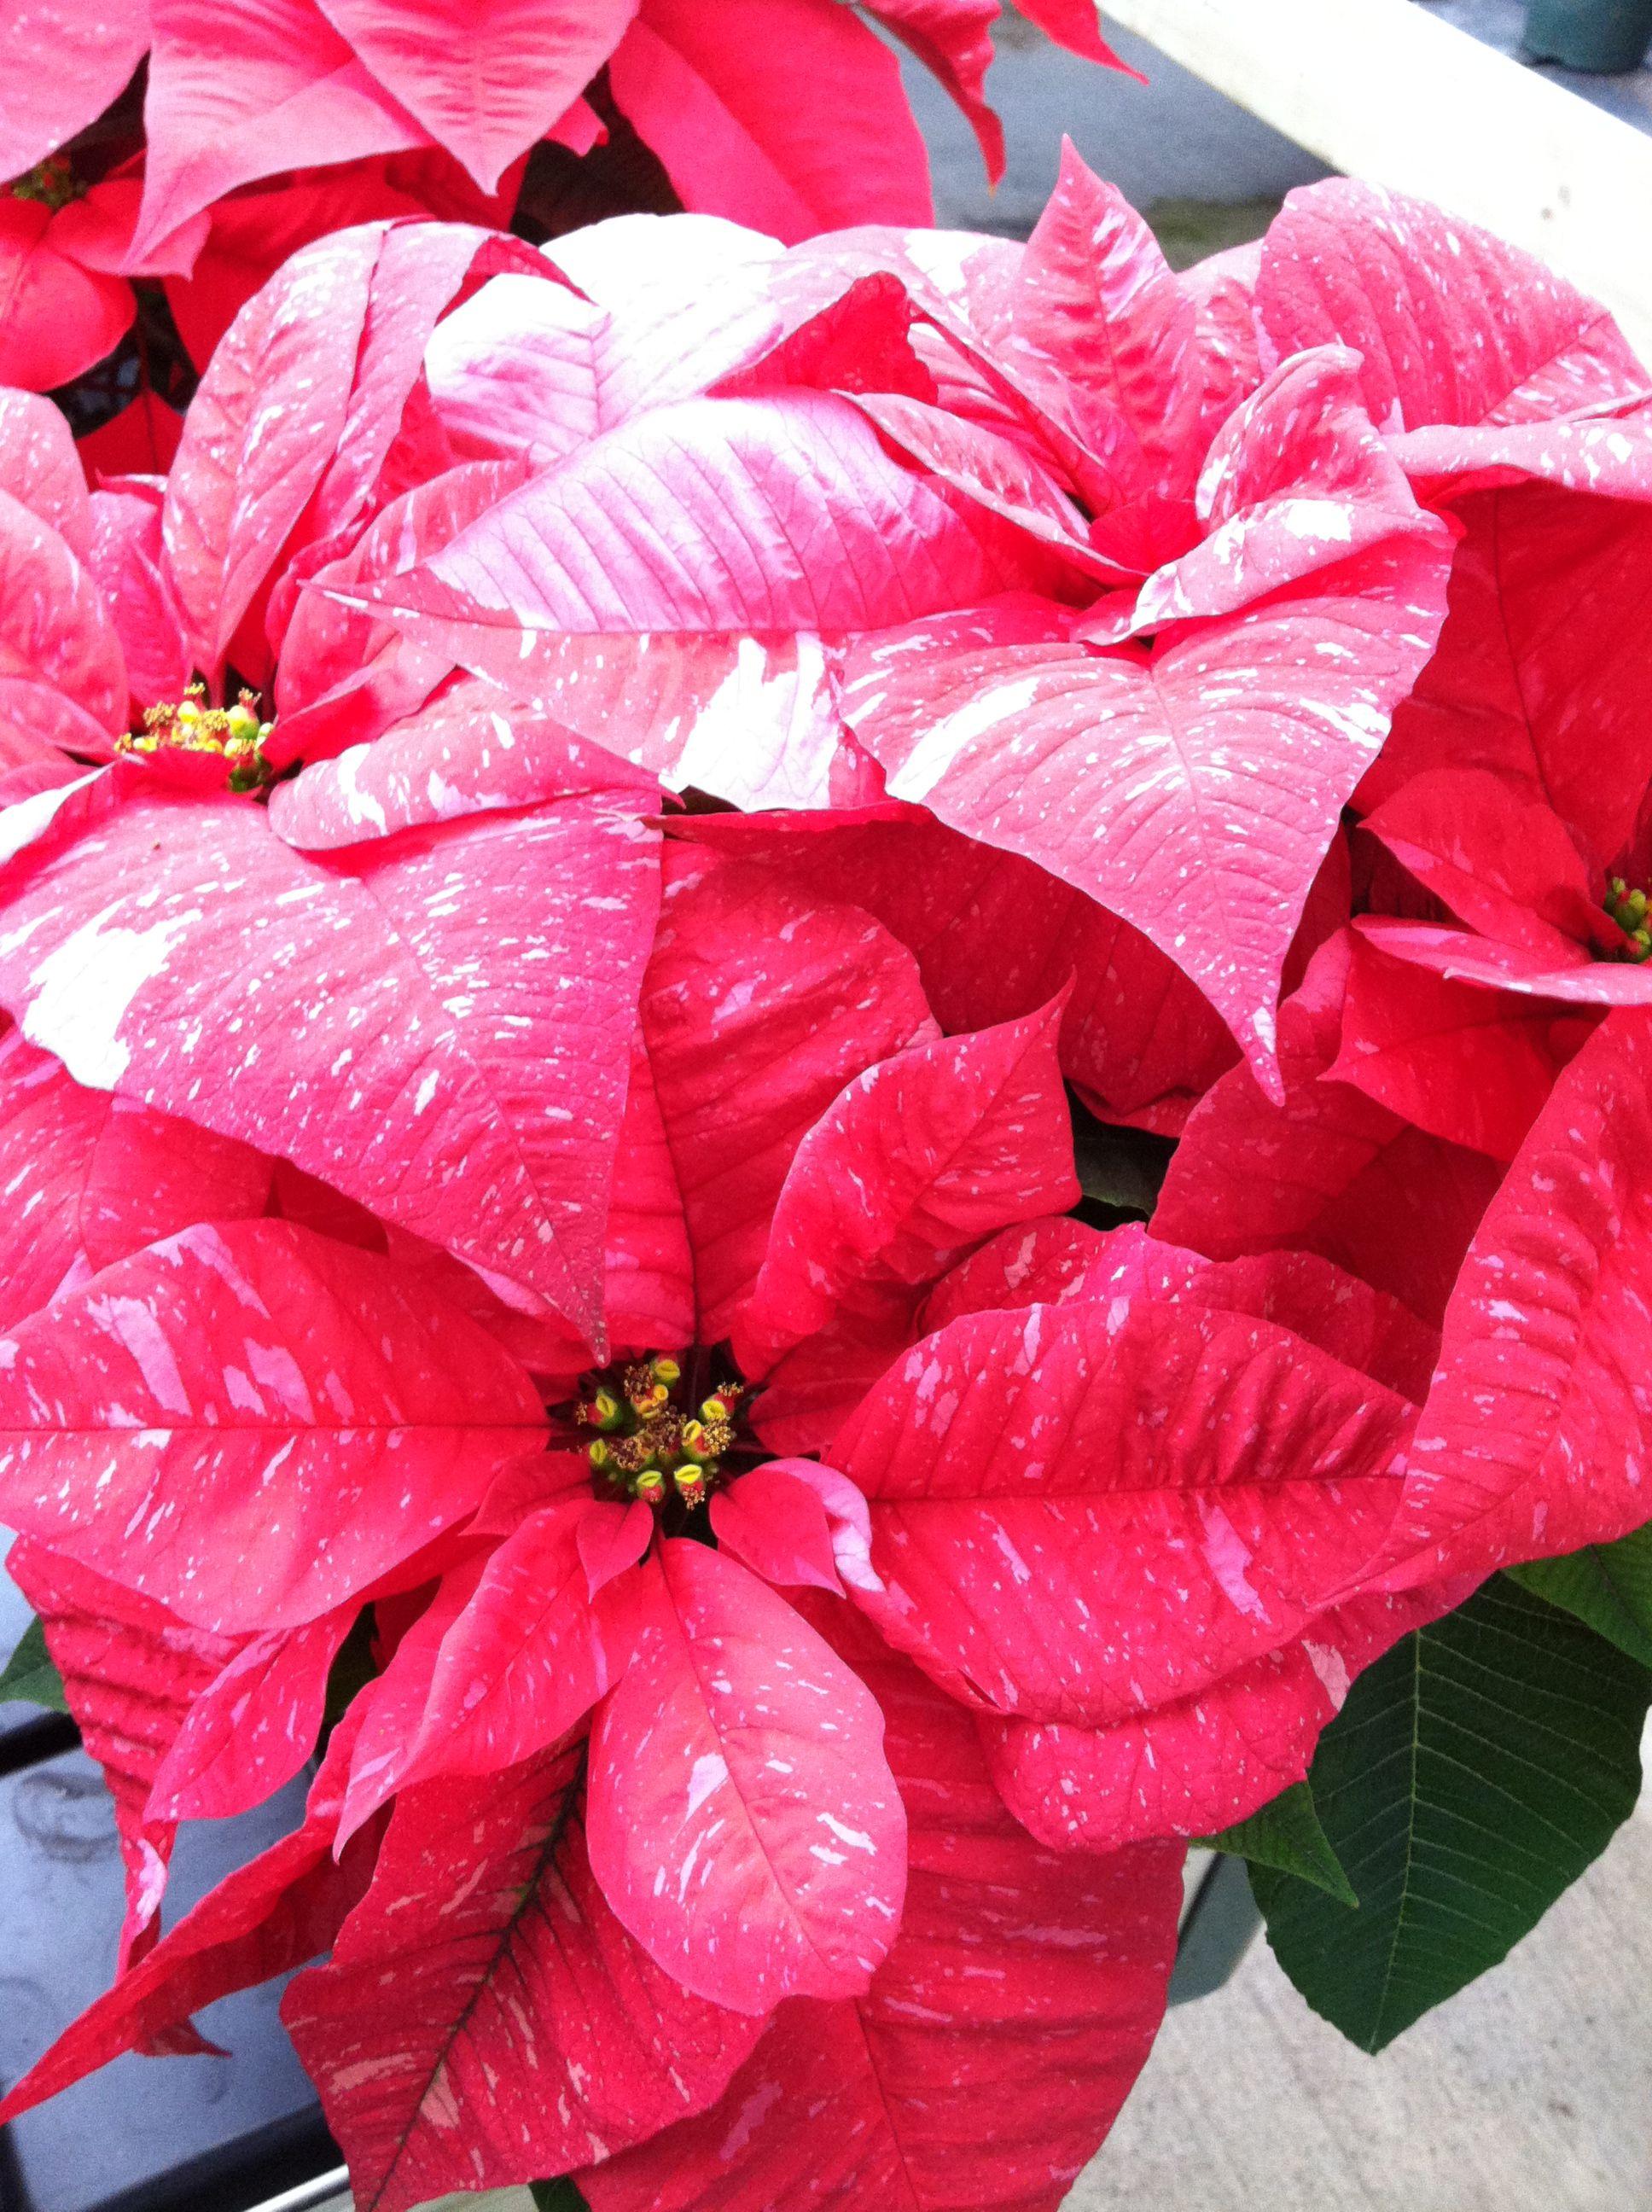 Poinsettia Flowers, Poinsettia, Plants